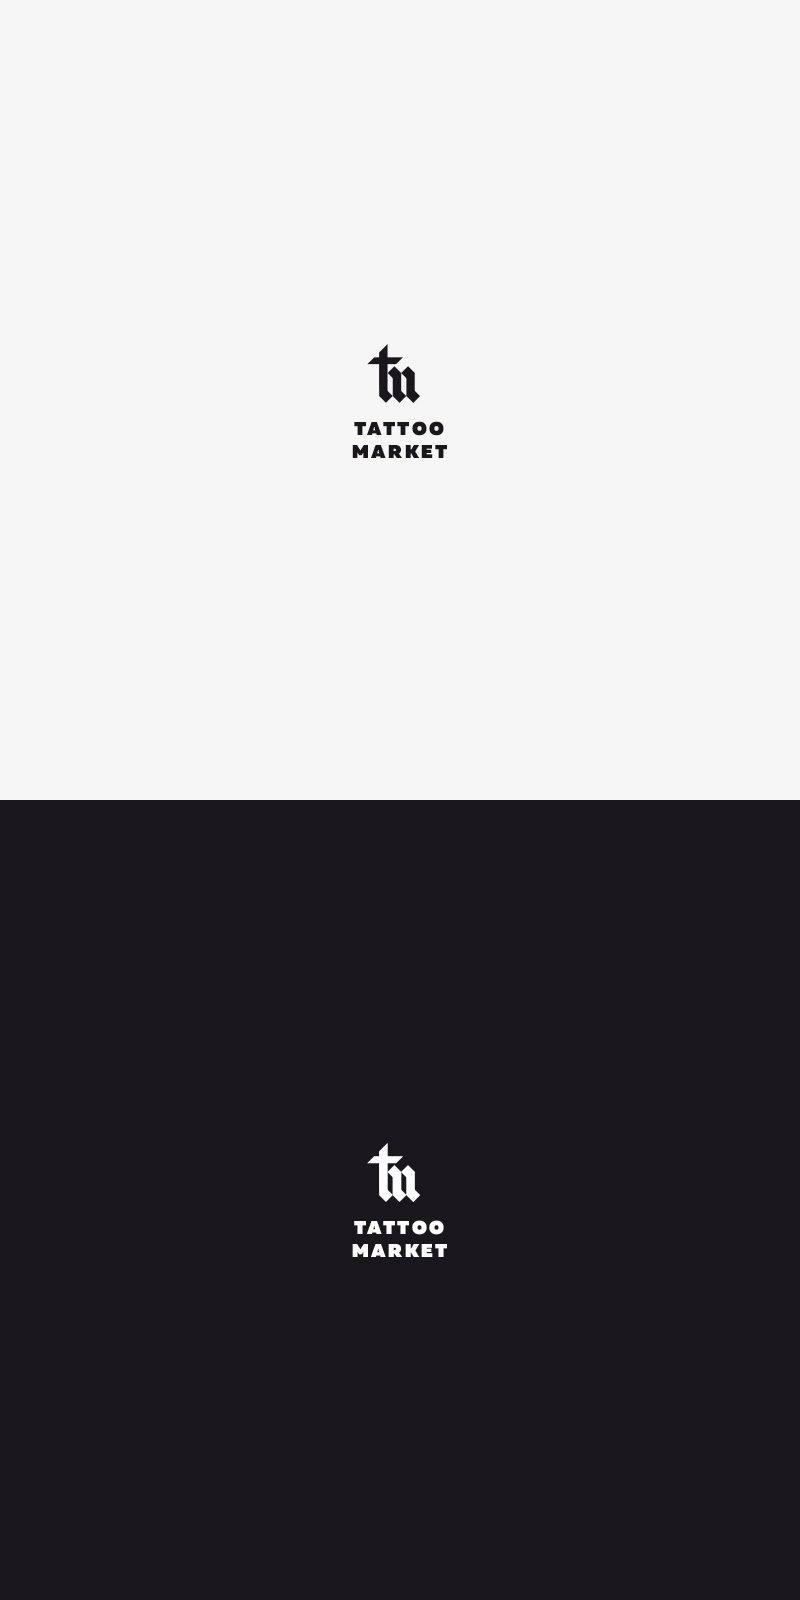 Редизайн логотипа магазина тату оборудования TattooMarket.ru фото f_9685c3faa466cb30.jpg